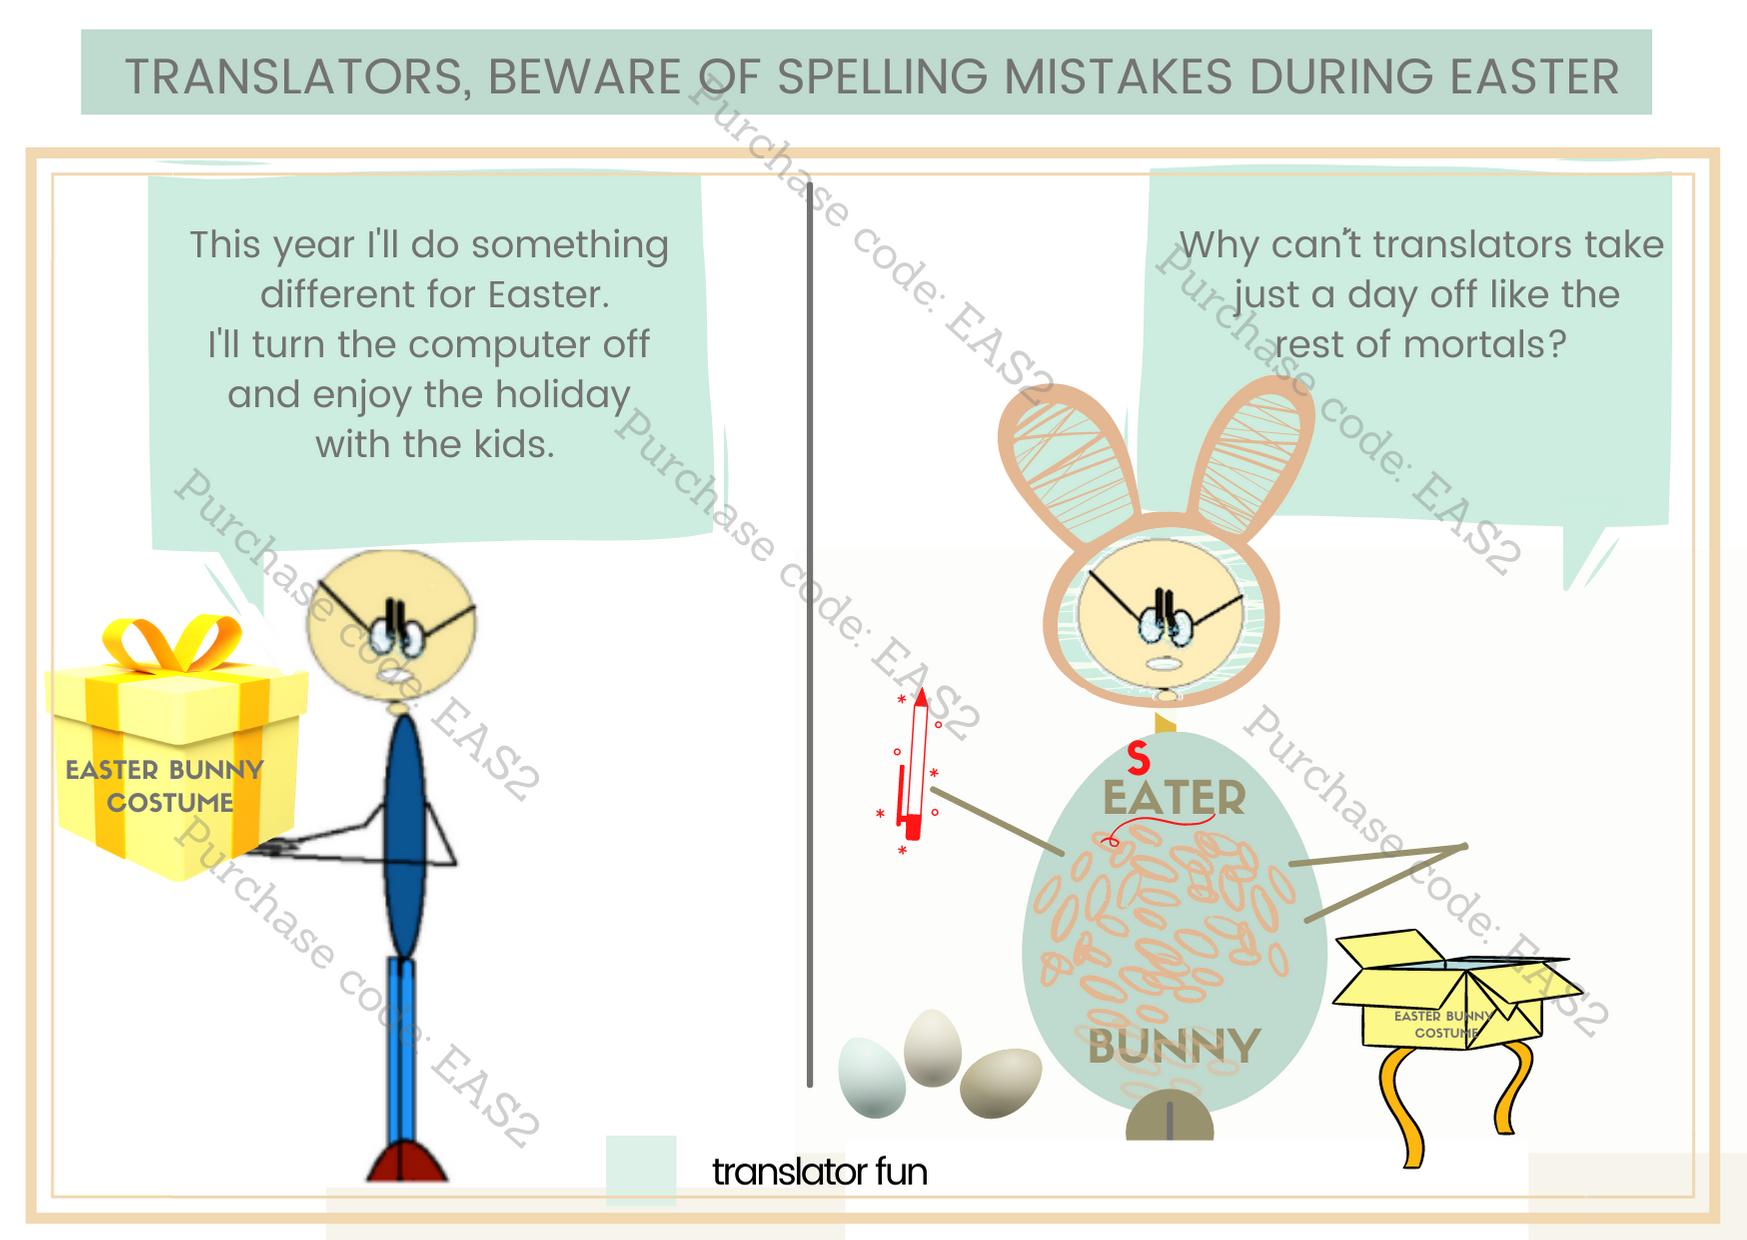 Translators at Easter